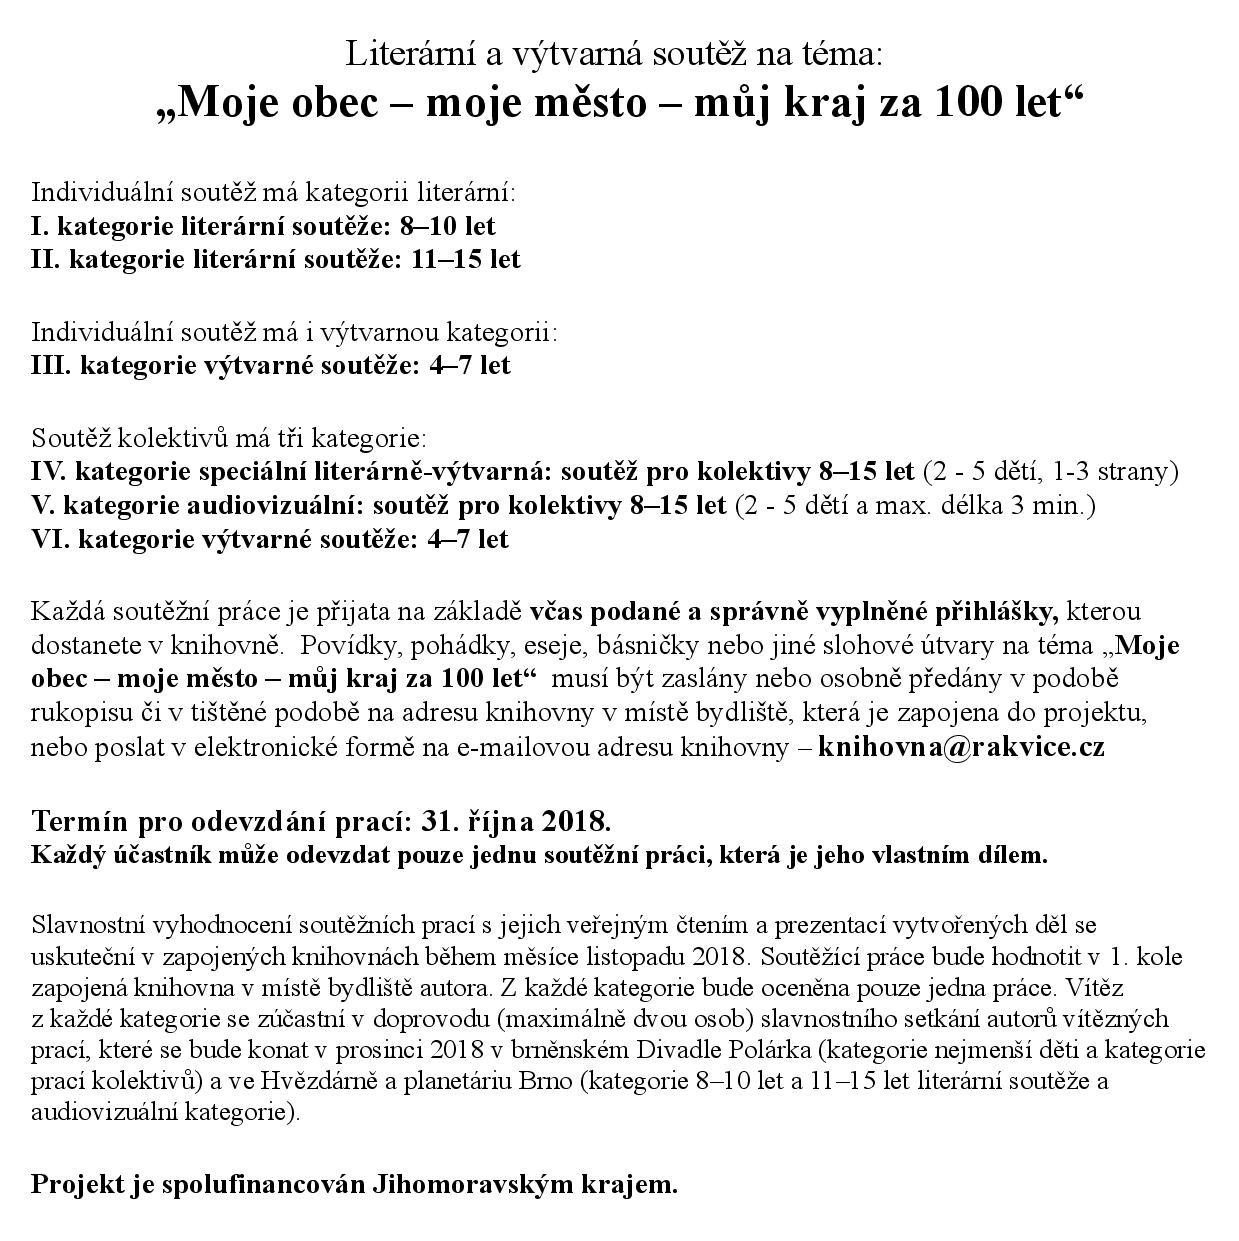 OBRÁZEK : jiznimoravacte_-_kopie-page-0011.jpg